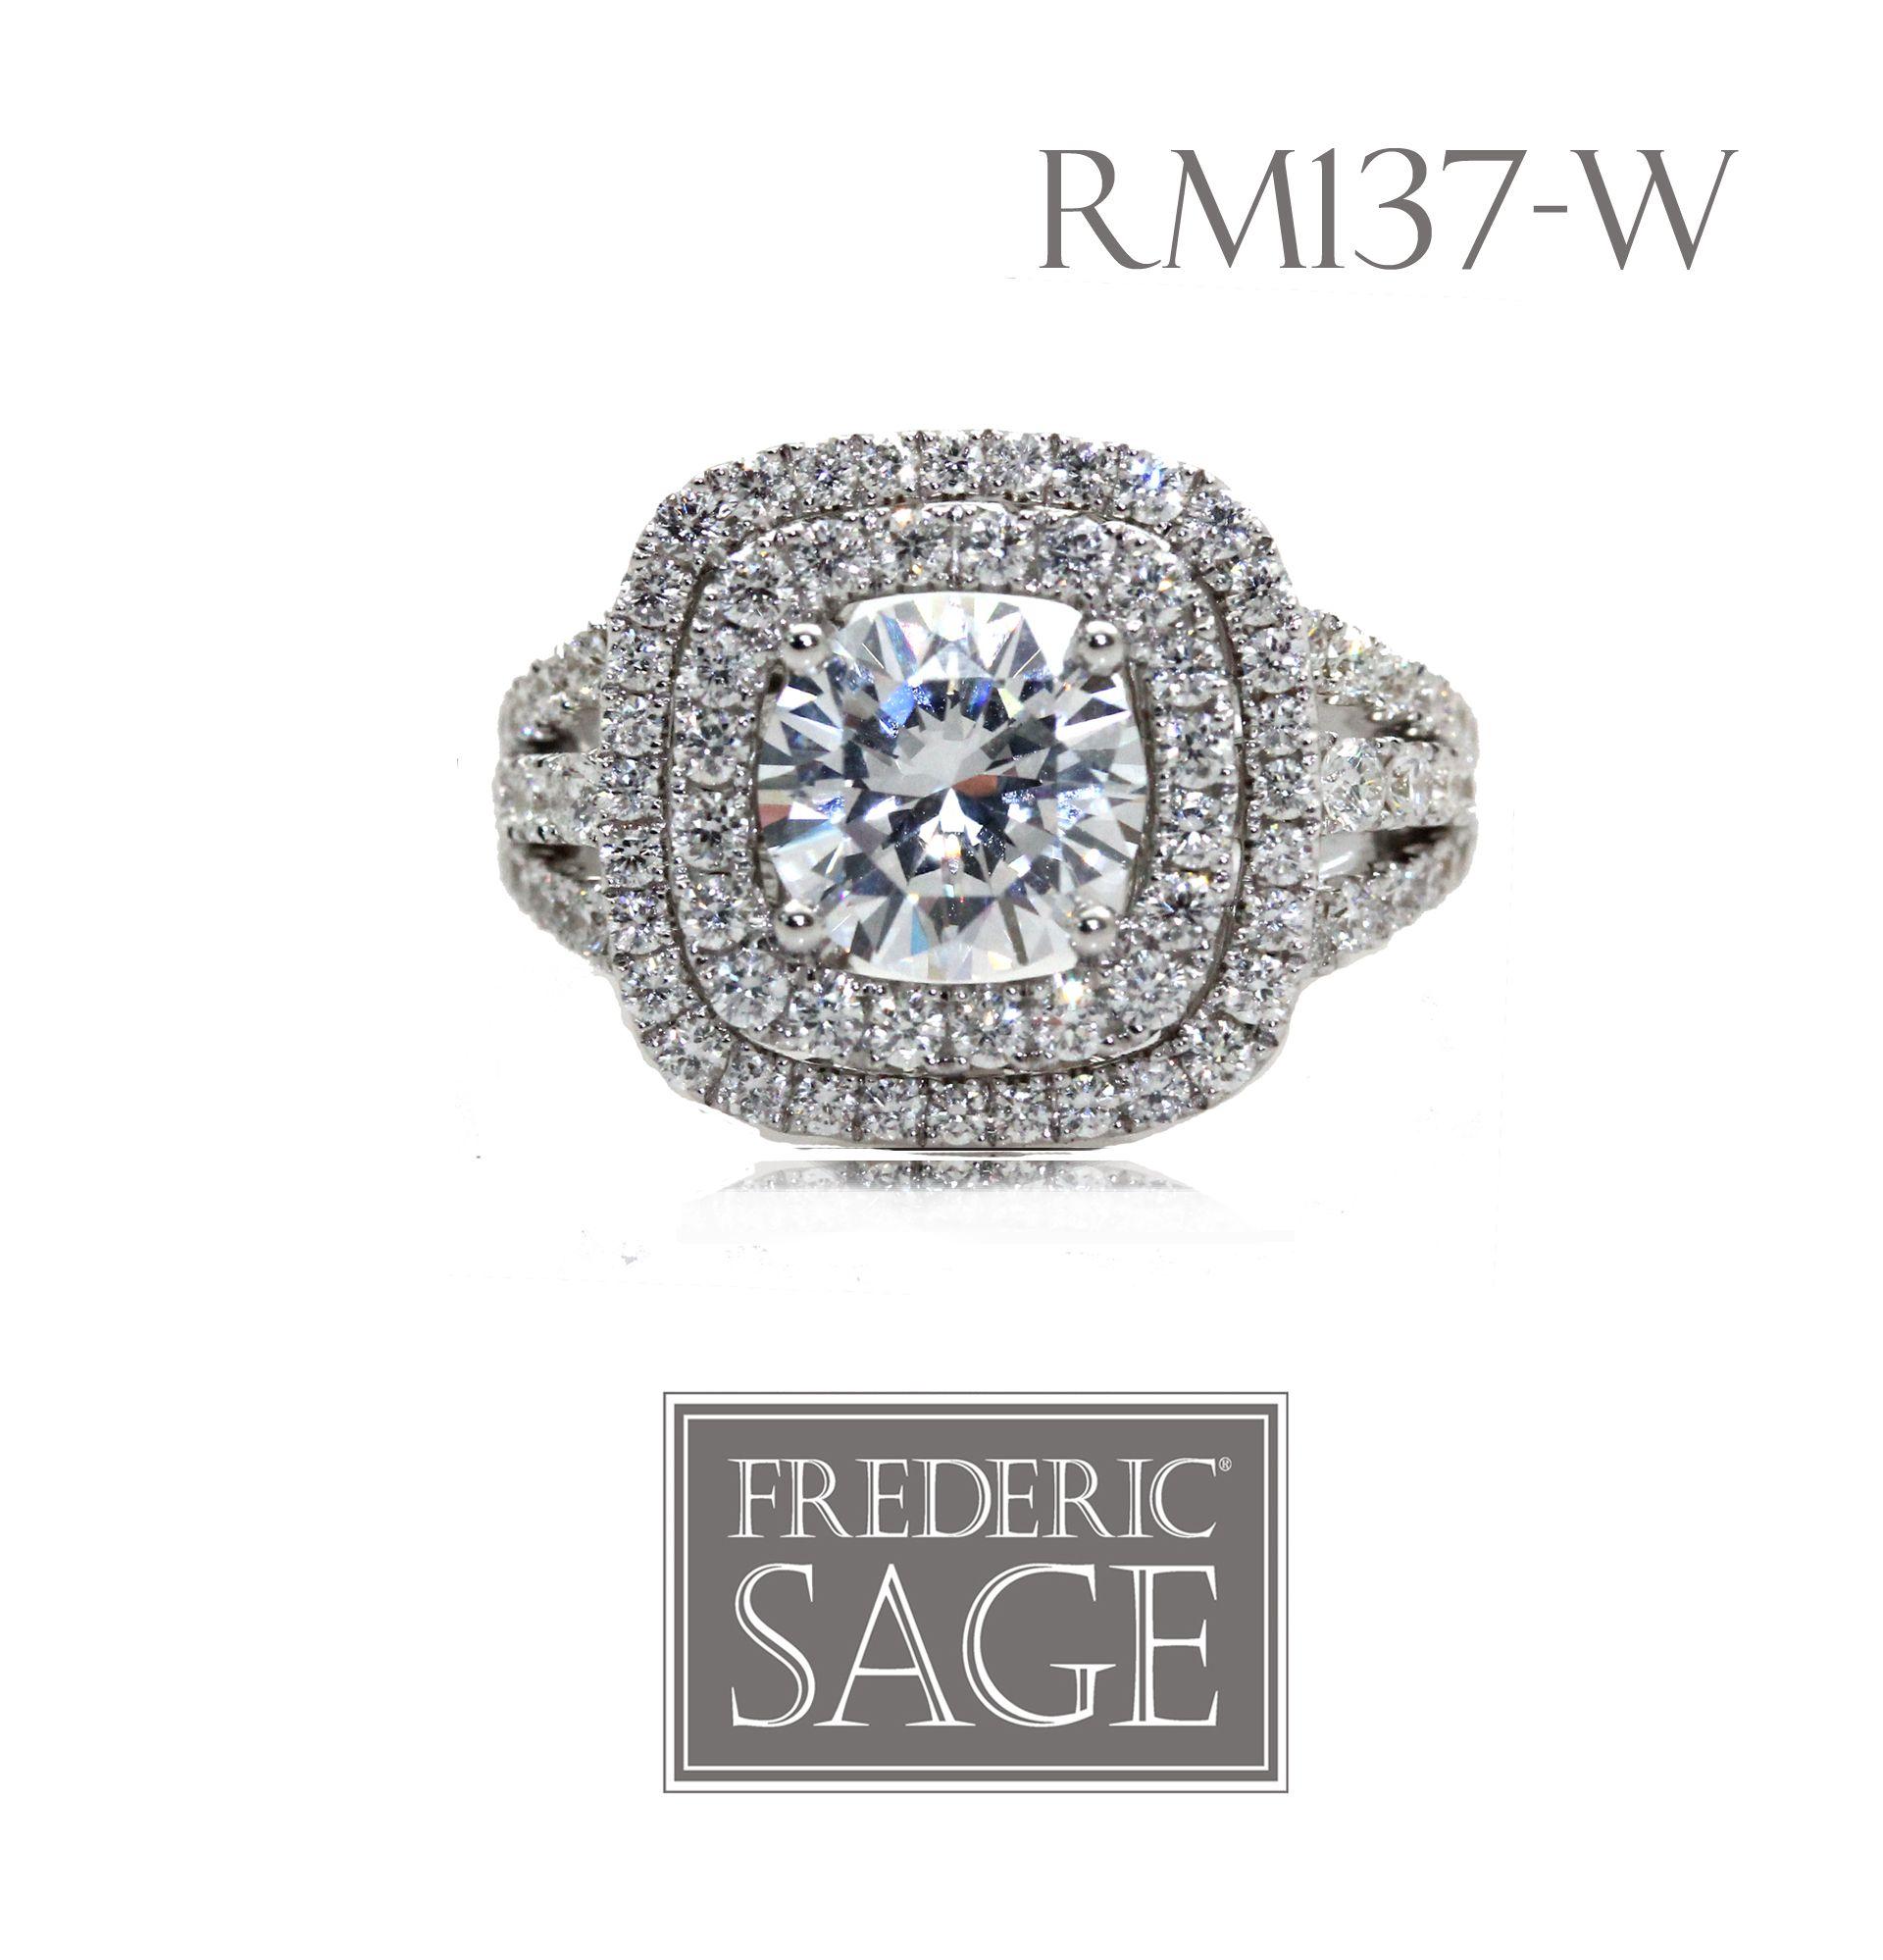 RM137 W Frederic Sage